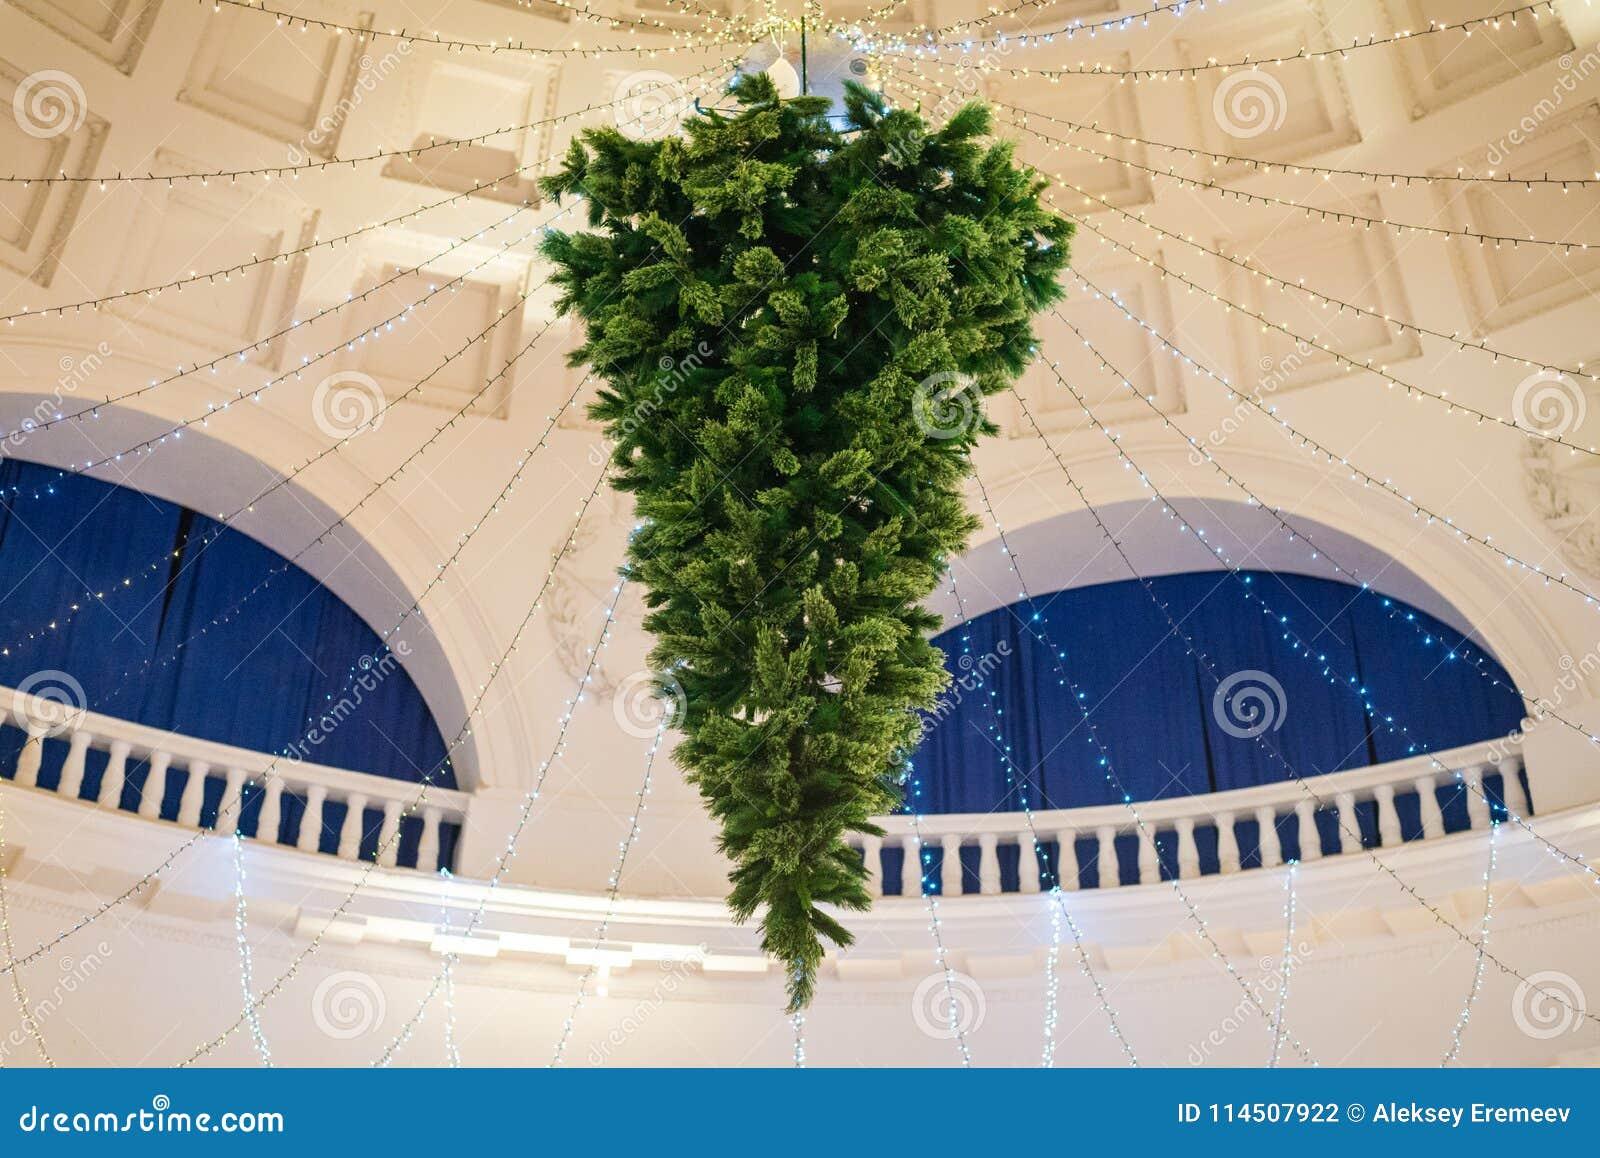 Upside Down Christmas Tree Ceiling.Christmas Tree Hanging Upside Down On The Ceiling Stock